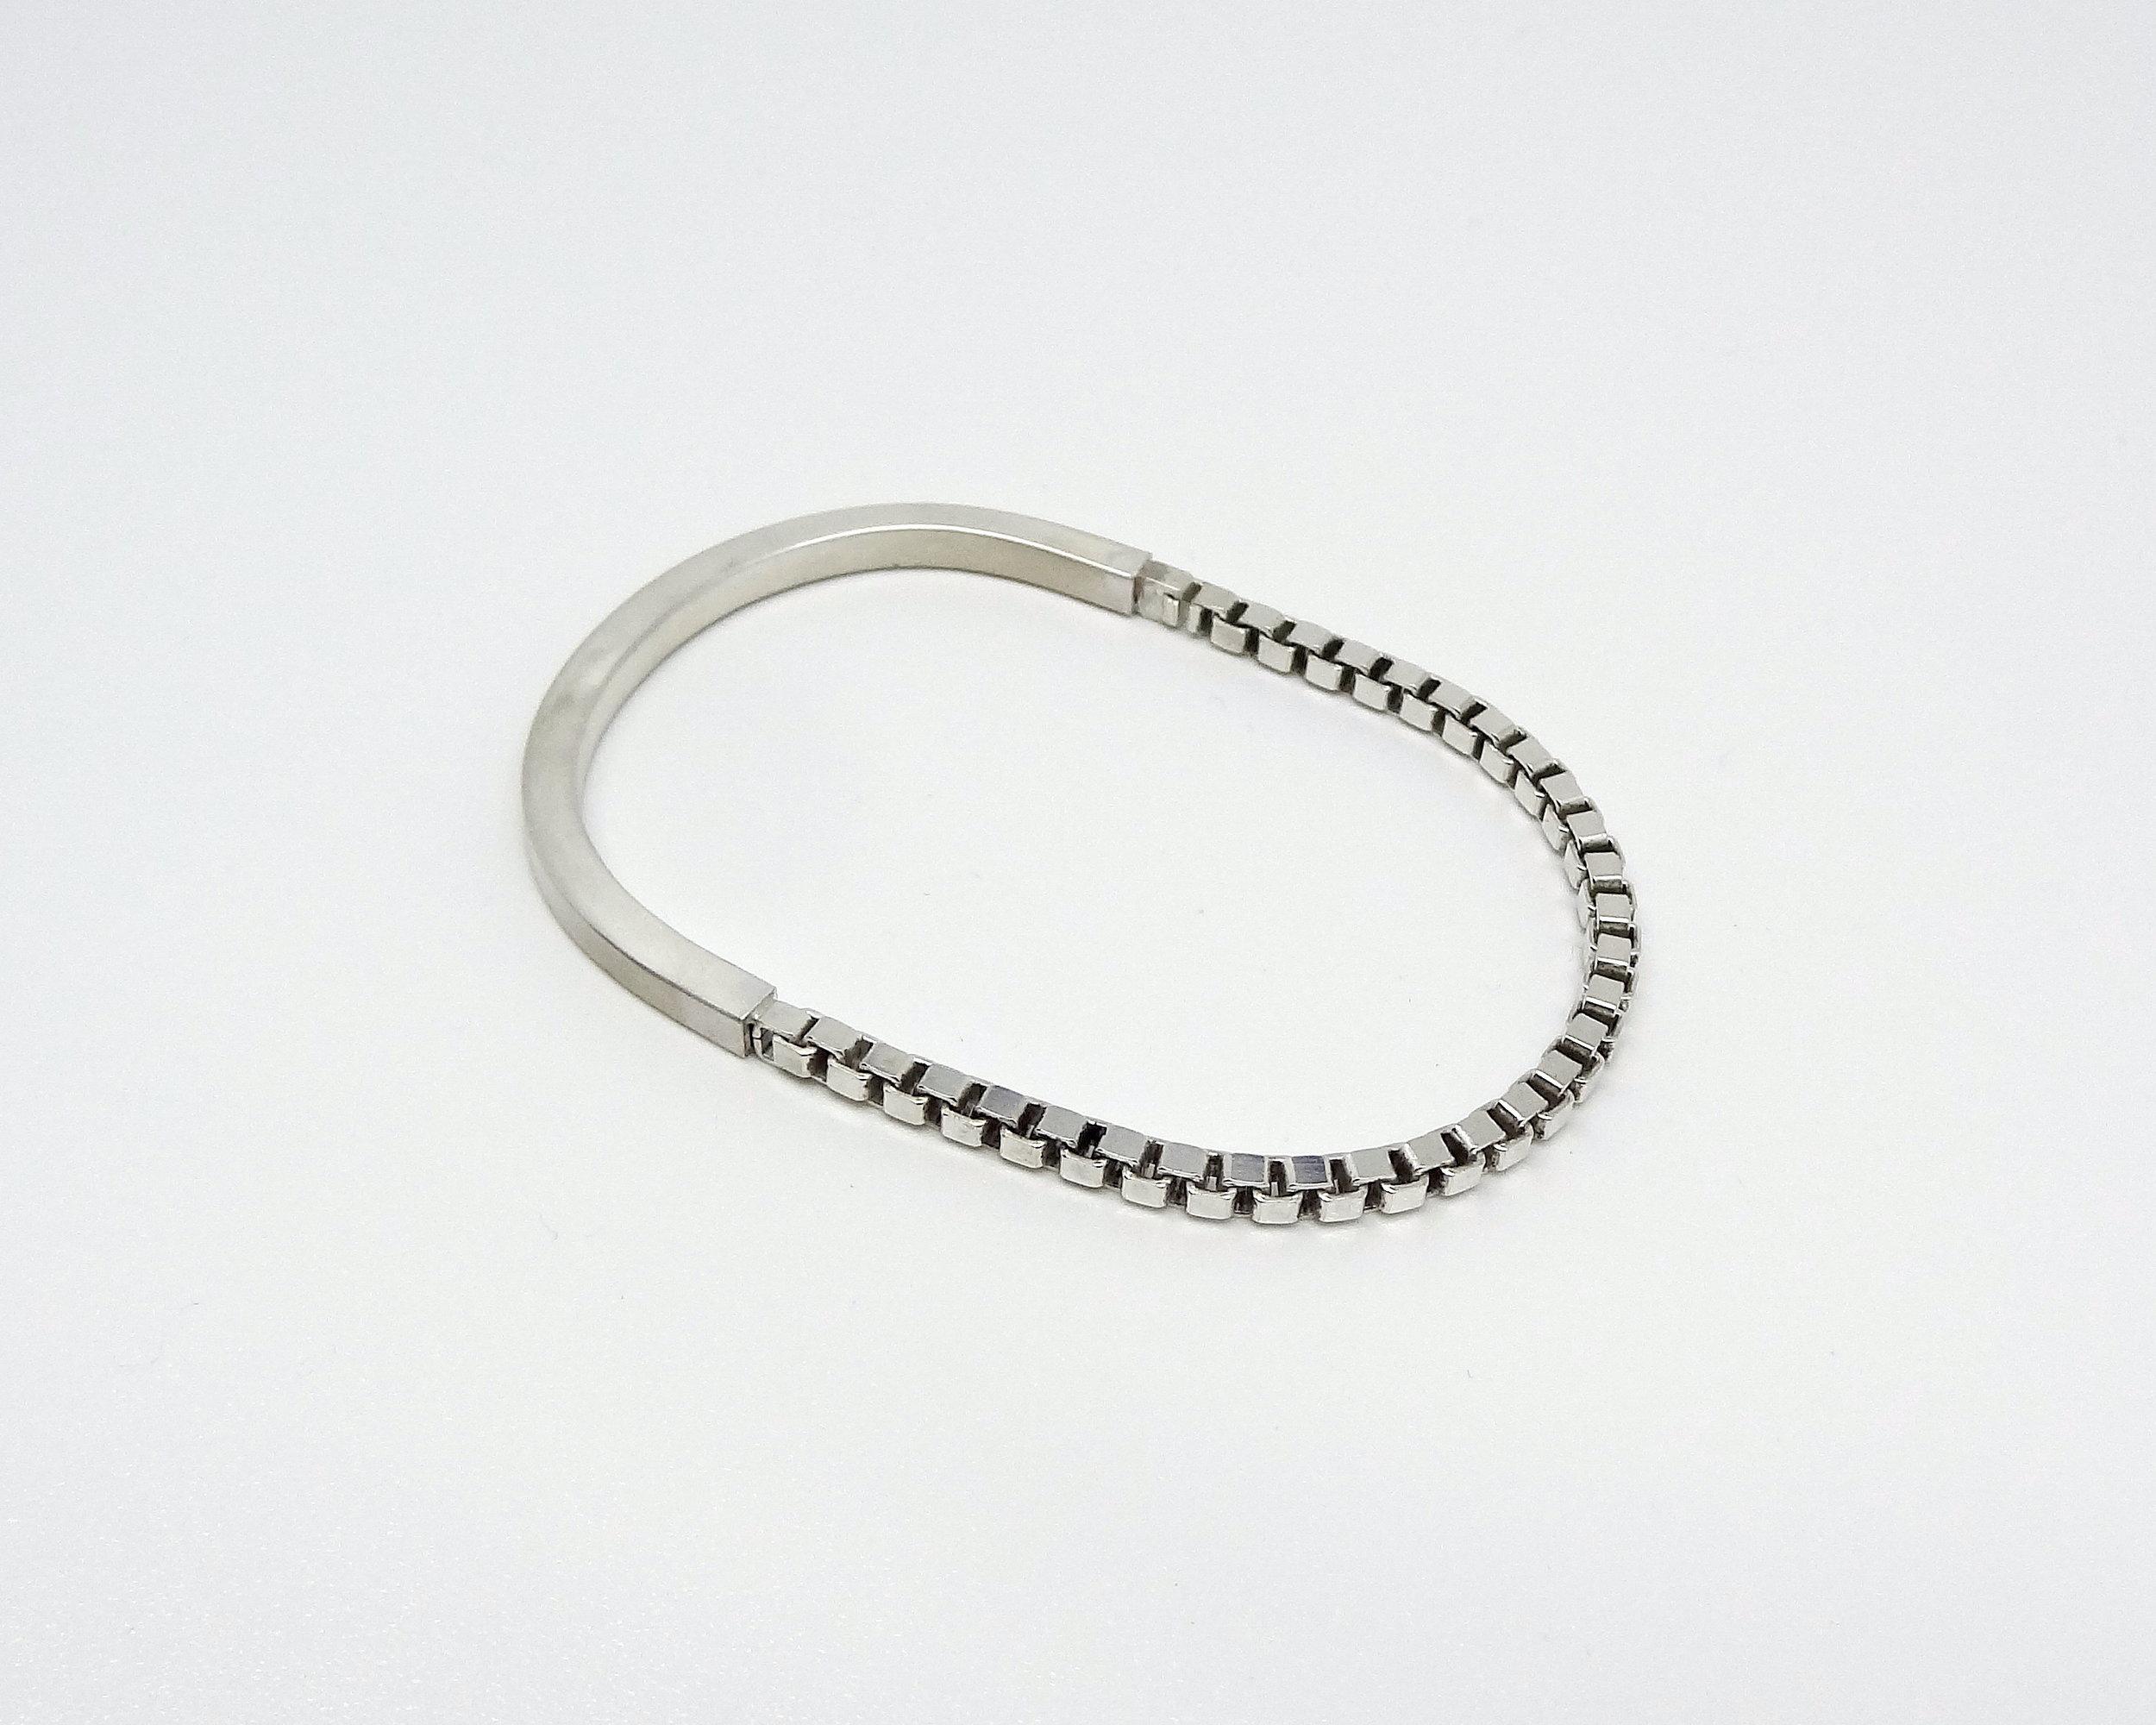 bracelet chain and tube angle.JPG